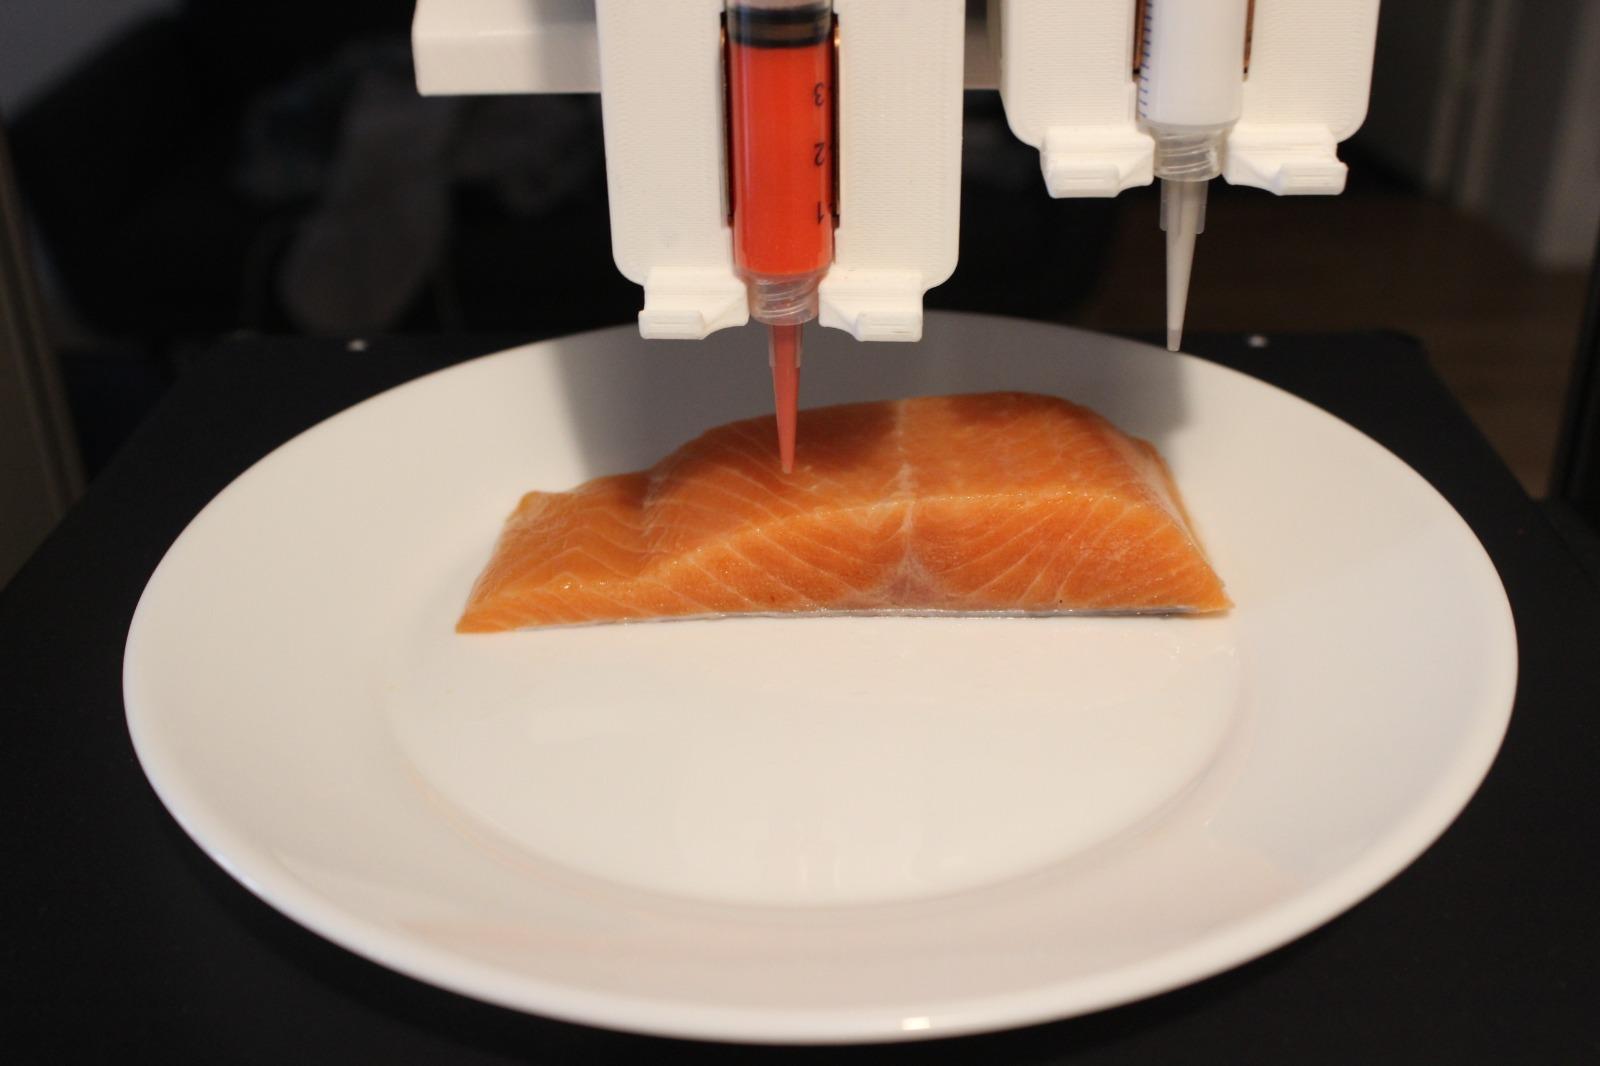 Salmon in the printing